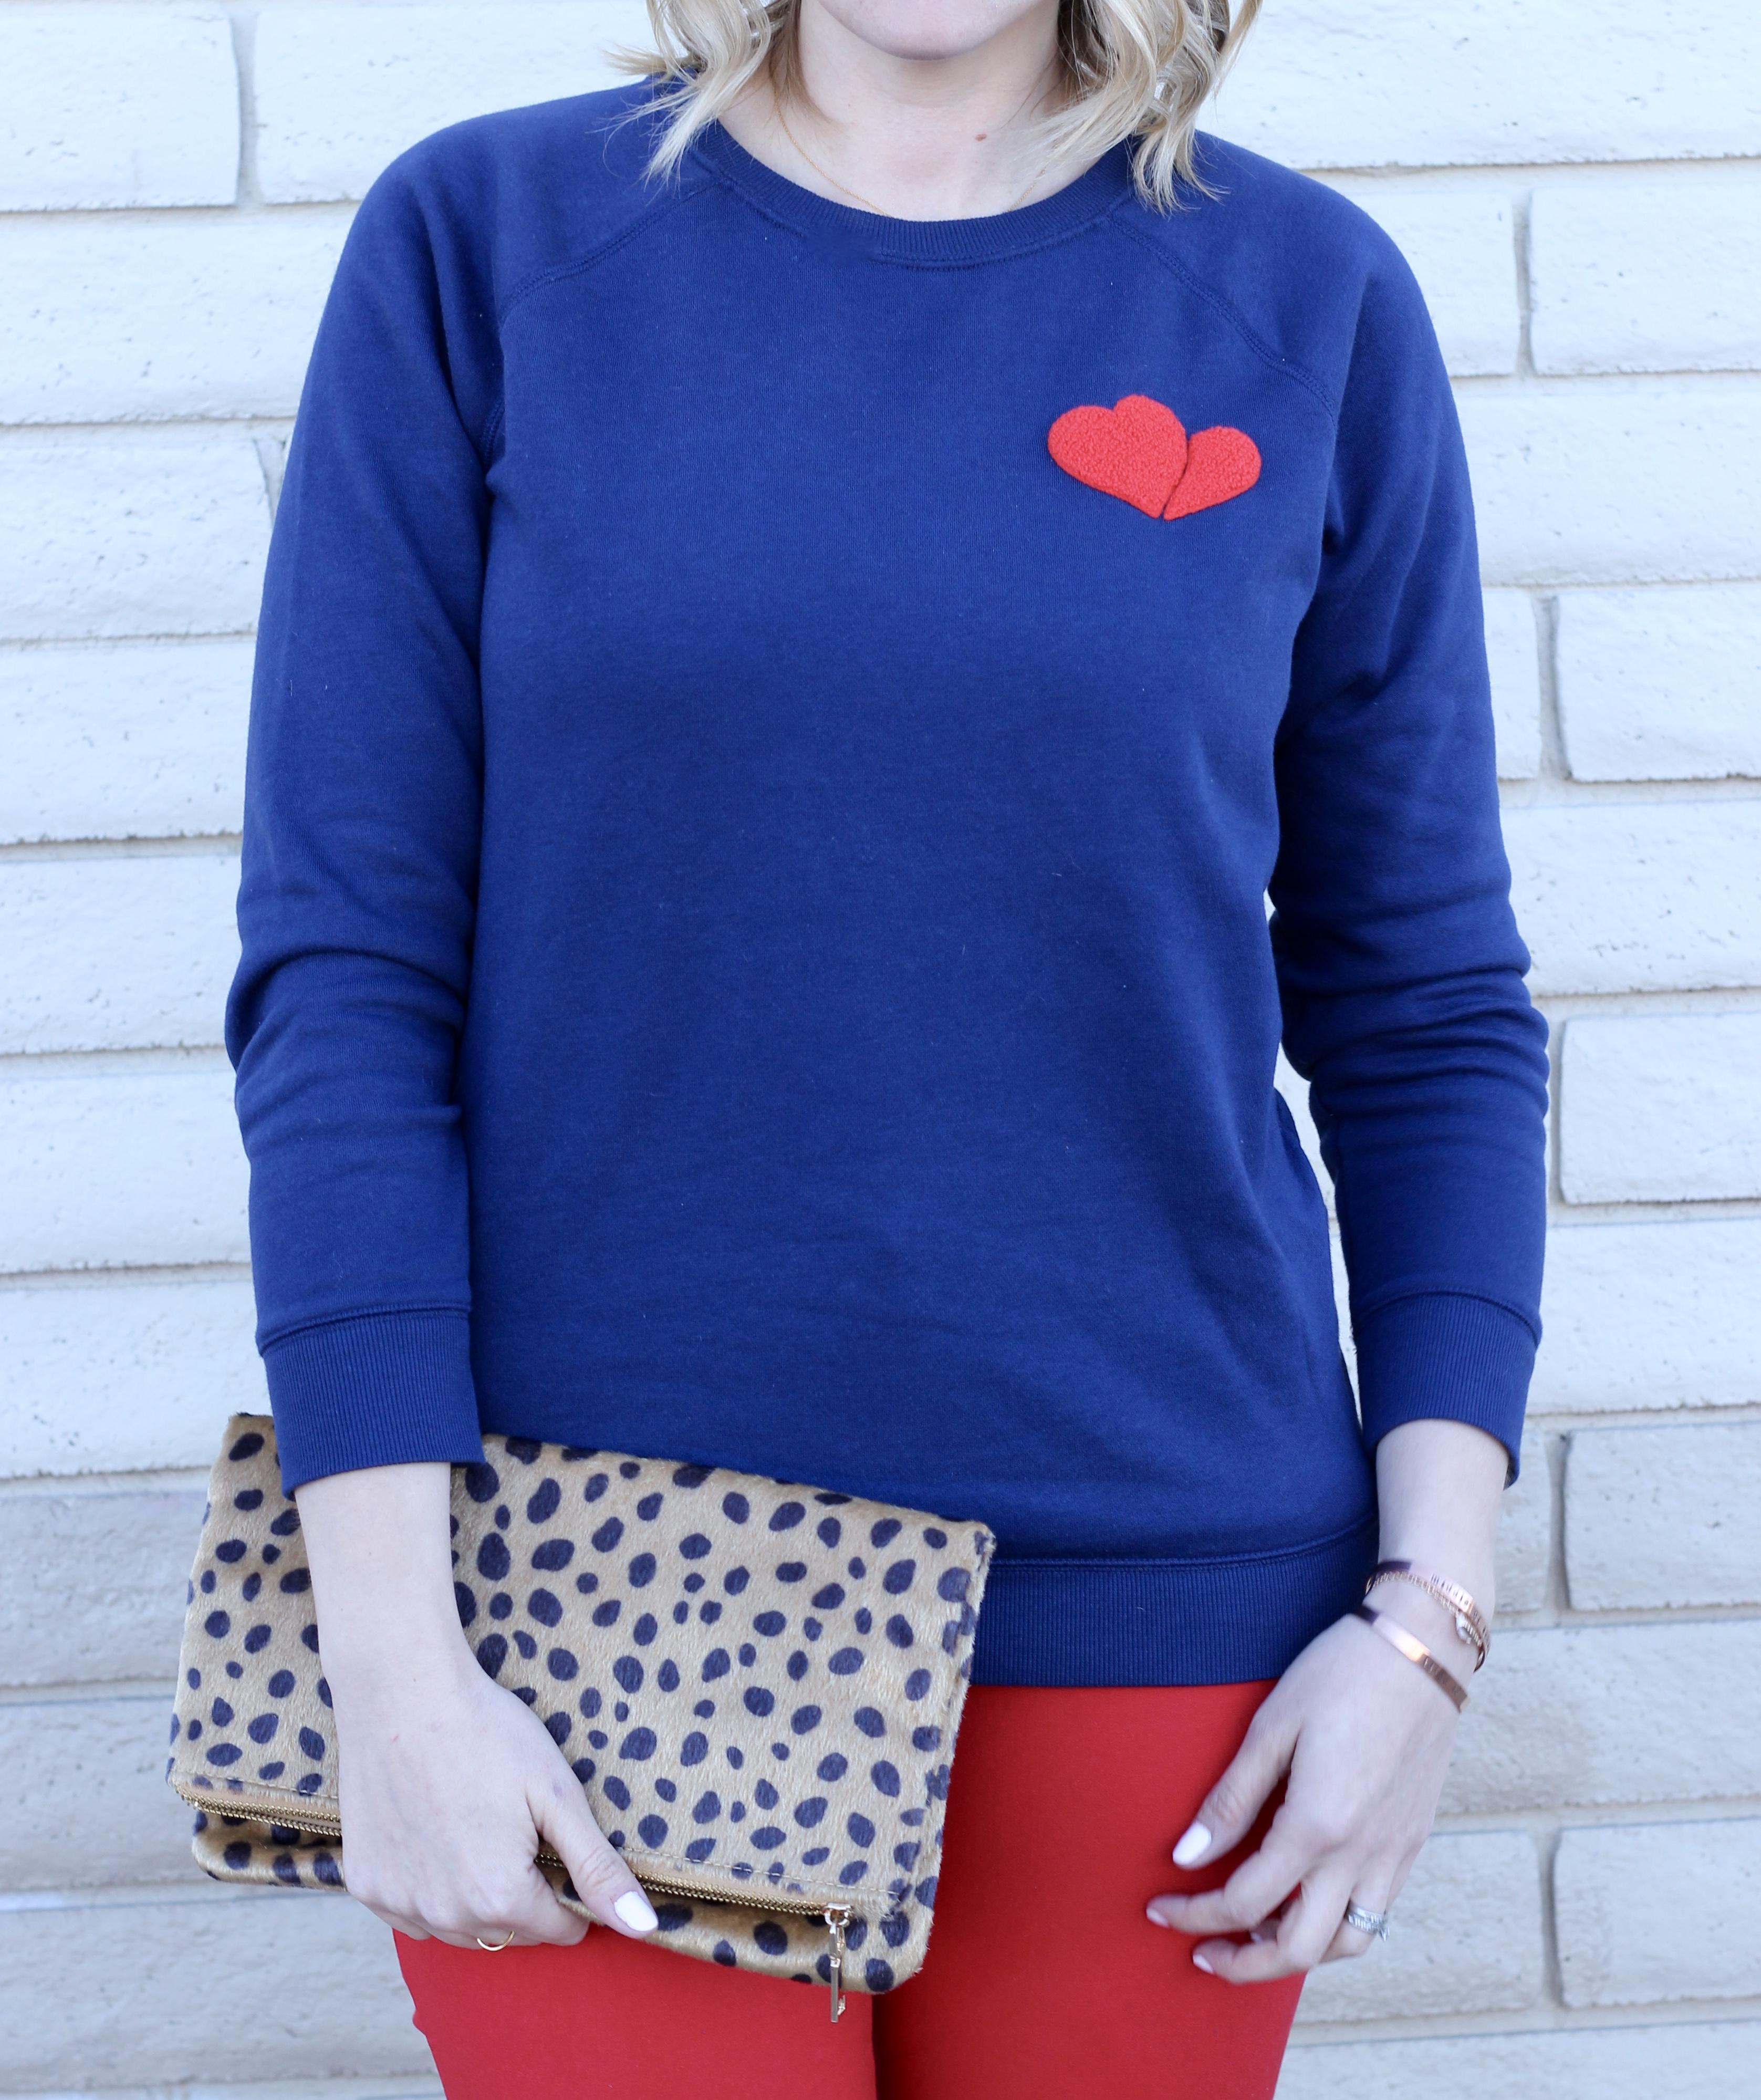 heart Old Navy graphic sweatshirt #oldnavystyle #valentinesday